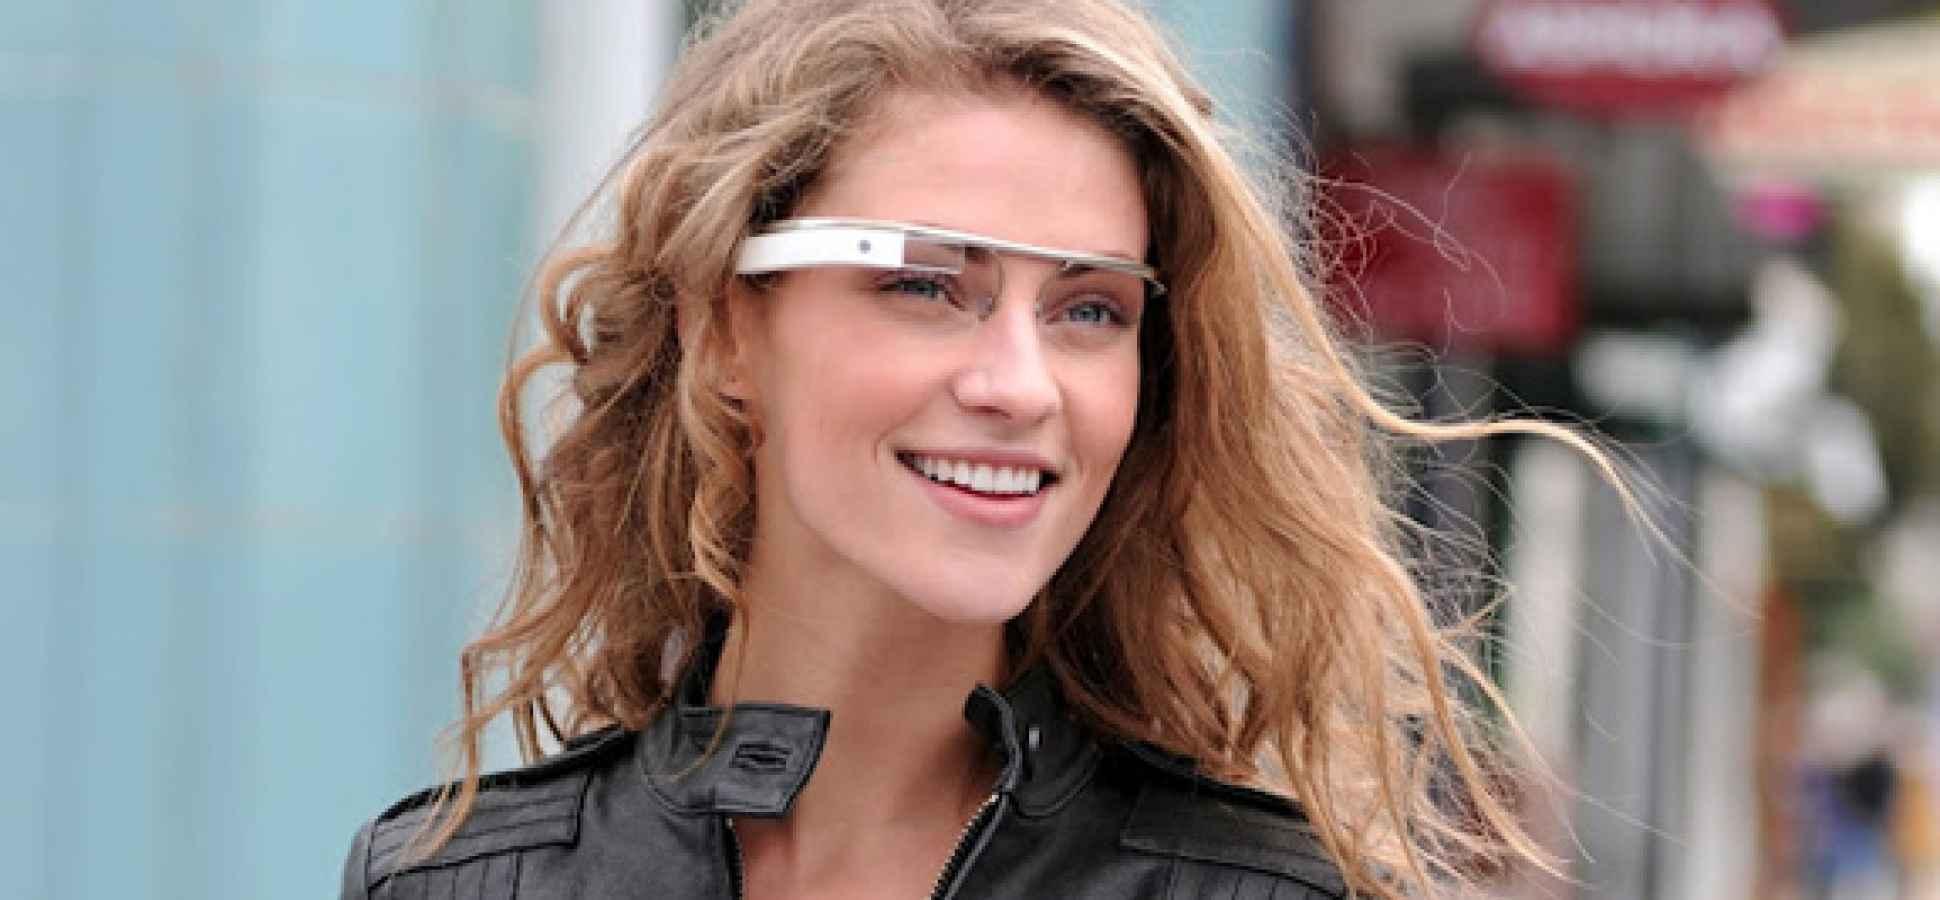 Google Glass: Not the Profitable Platform Developers Want?